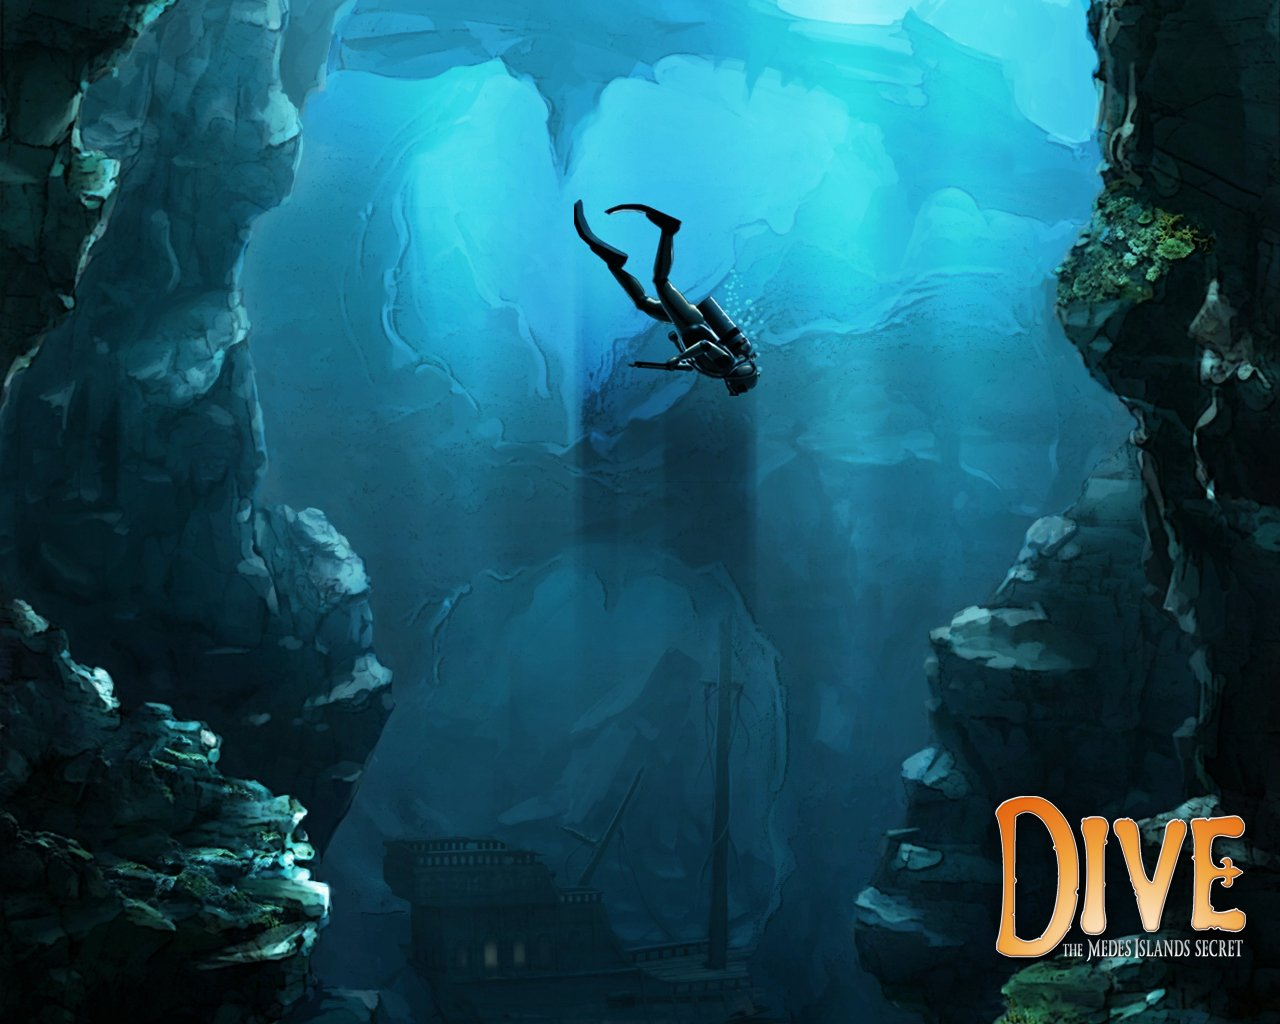 scuba diving wallpaper wallpapers - photo #44